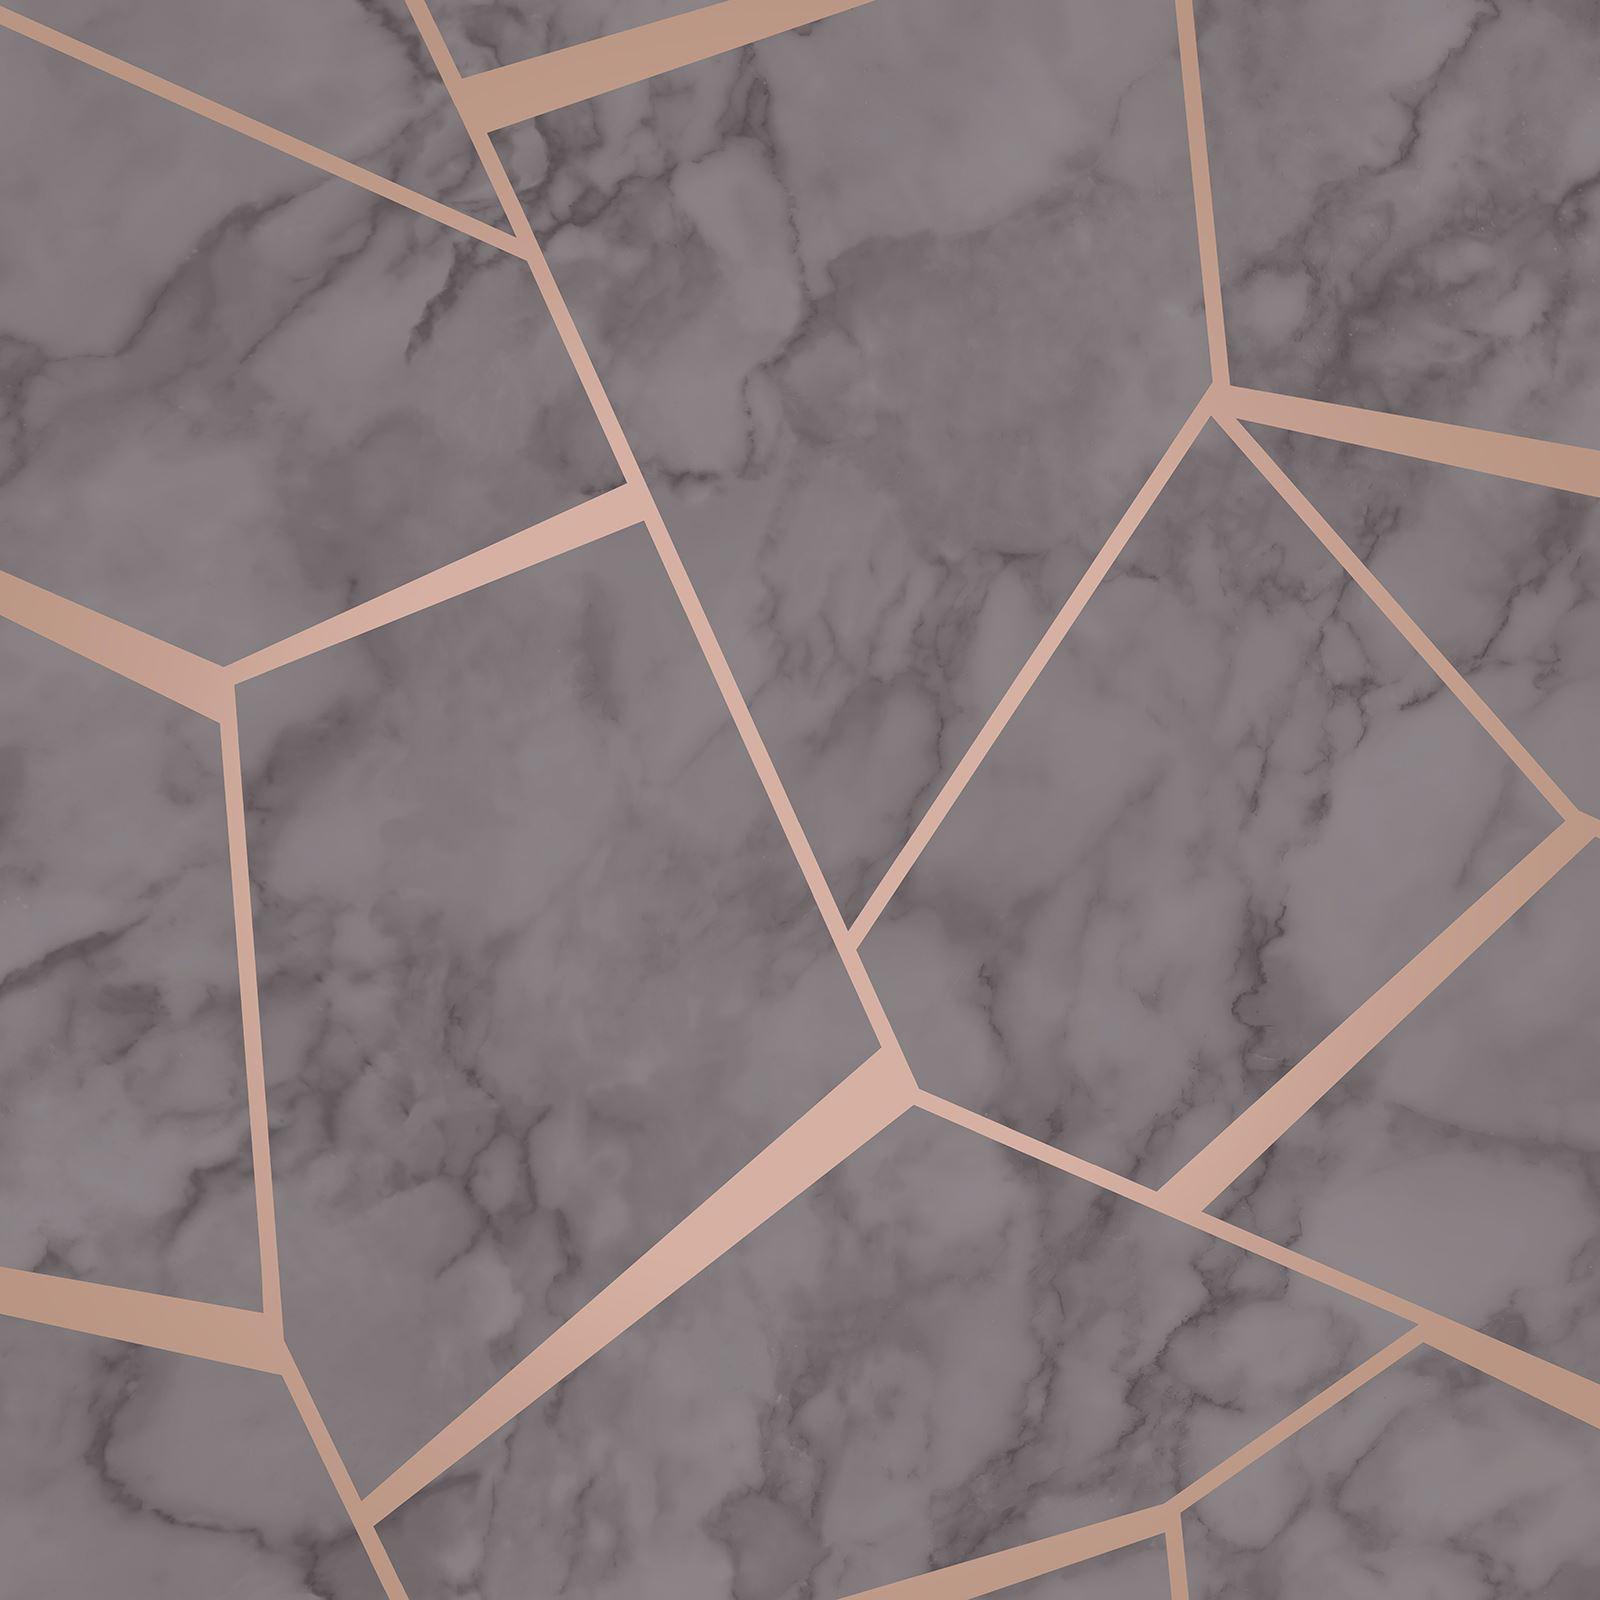 Fantastic Wallpaper Harry Potter Marble - 292441727641_images  Collection_6610082.jpeg